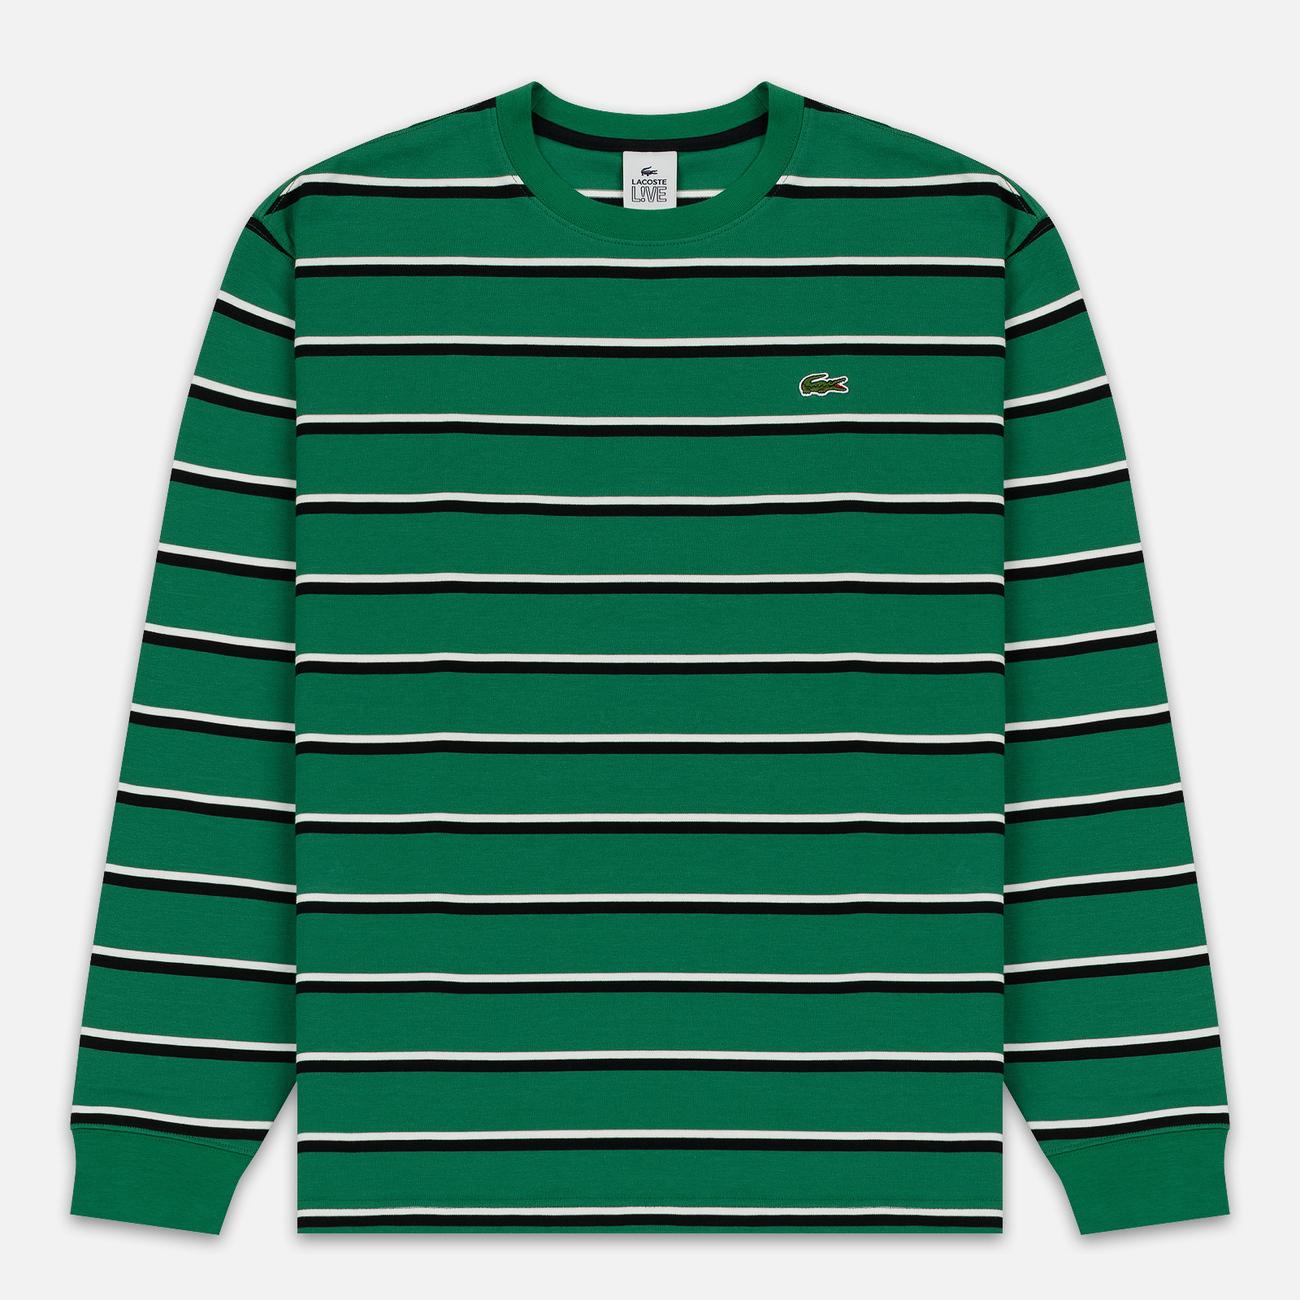 Мужской лонгслив Lacoste Live Crew Neck Striped Cotton Green/Black/White